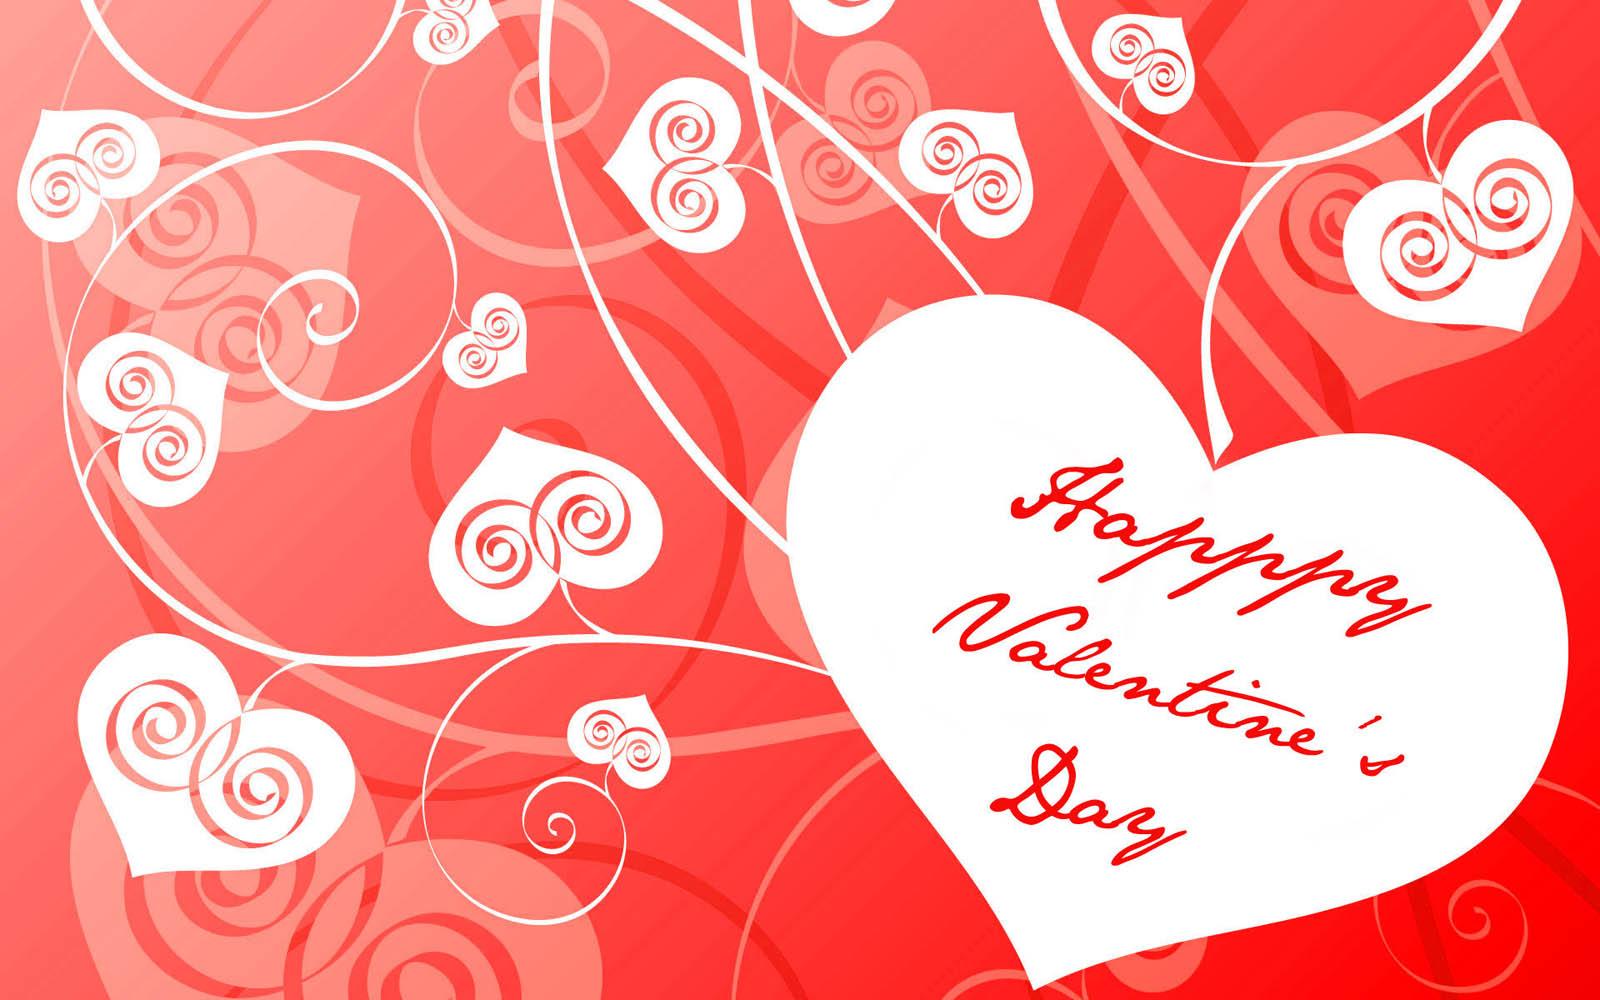 valentines day background wallpaper - photo #13